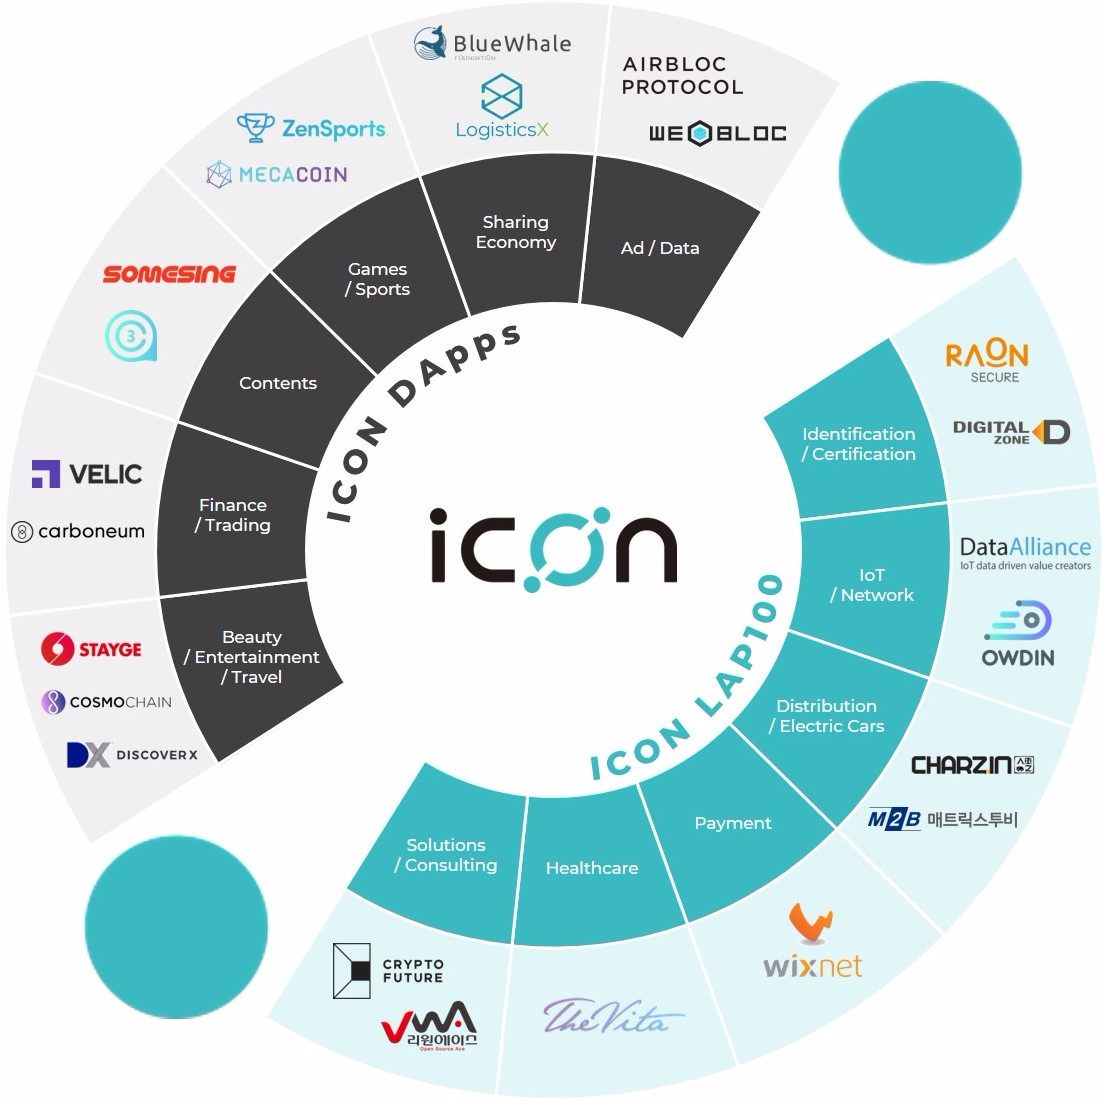 ICON宣称加速扩展其公链生态系统